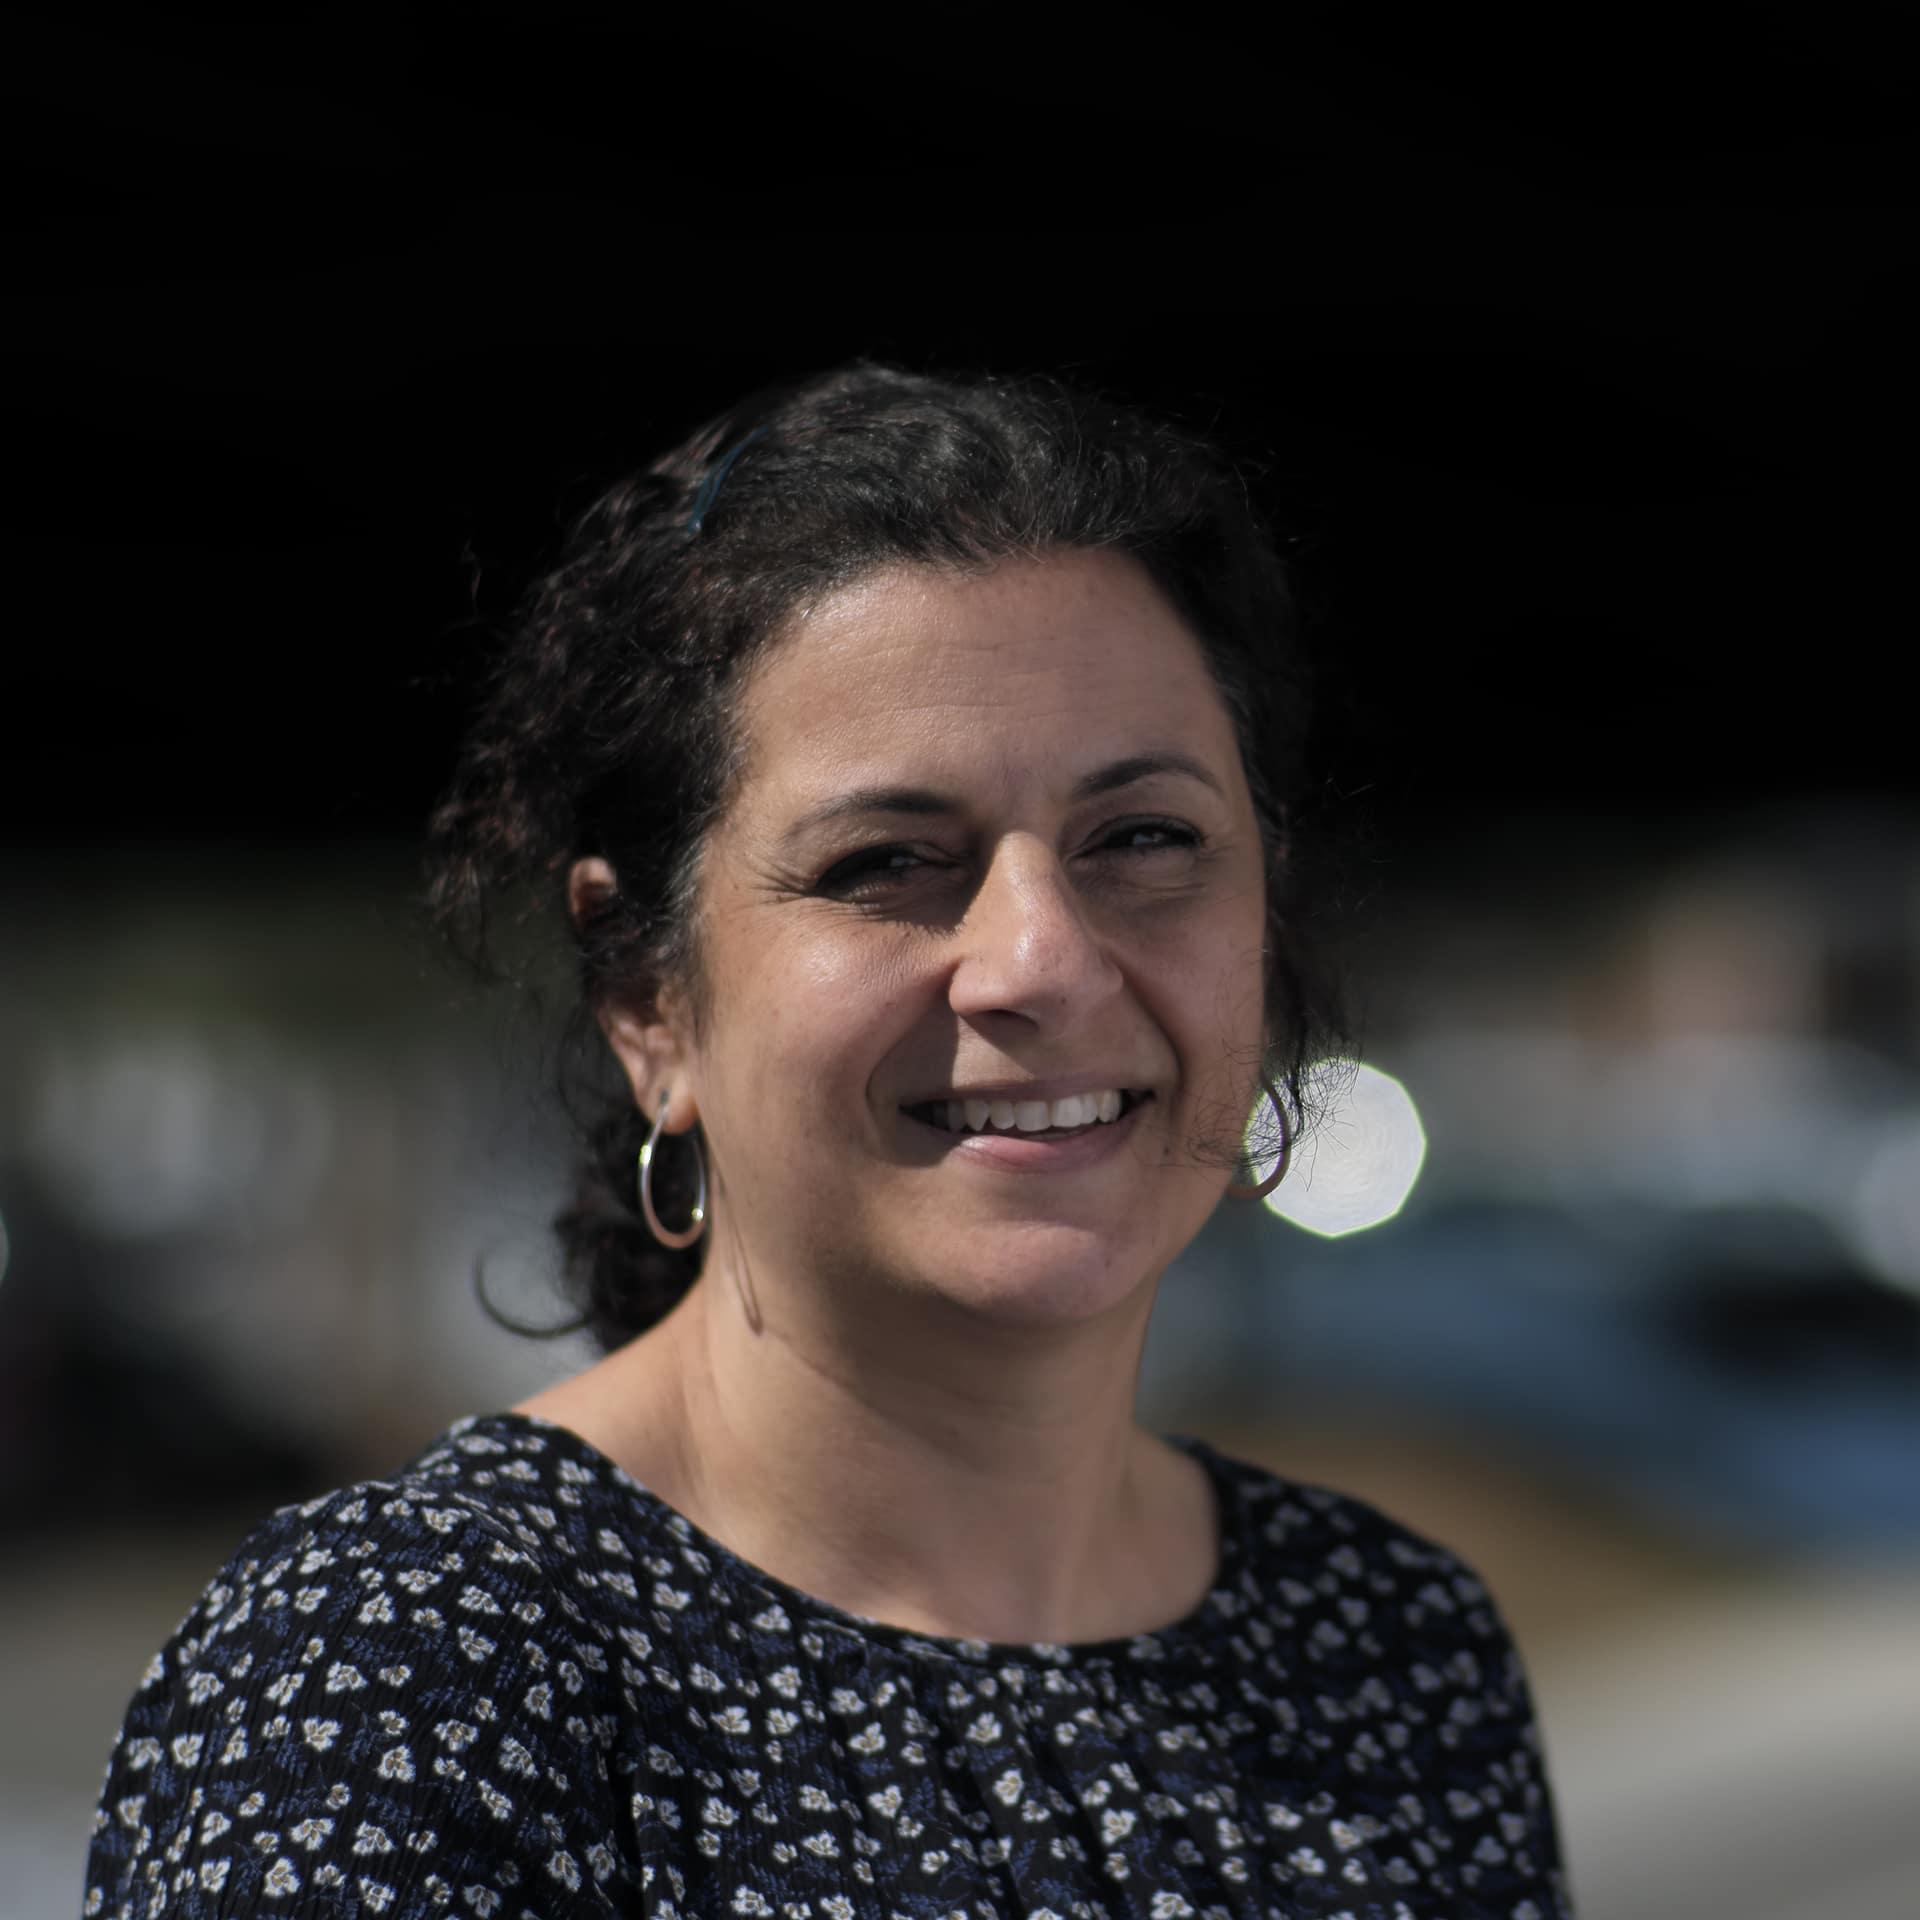 Amani Zabski - Technology Revealed